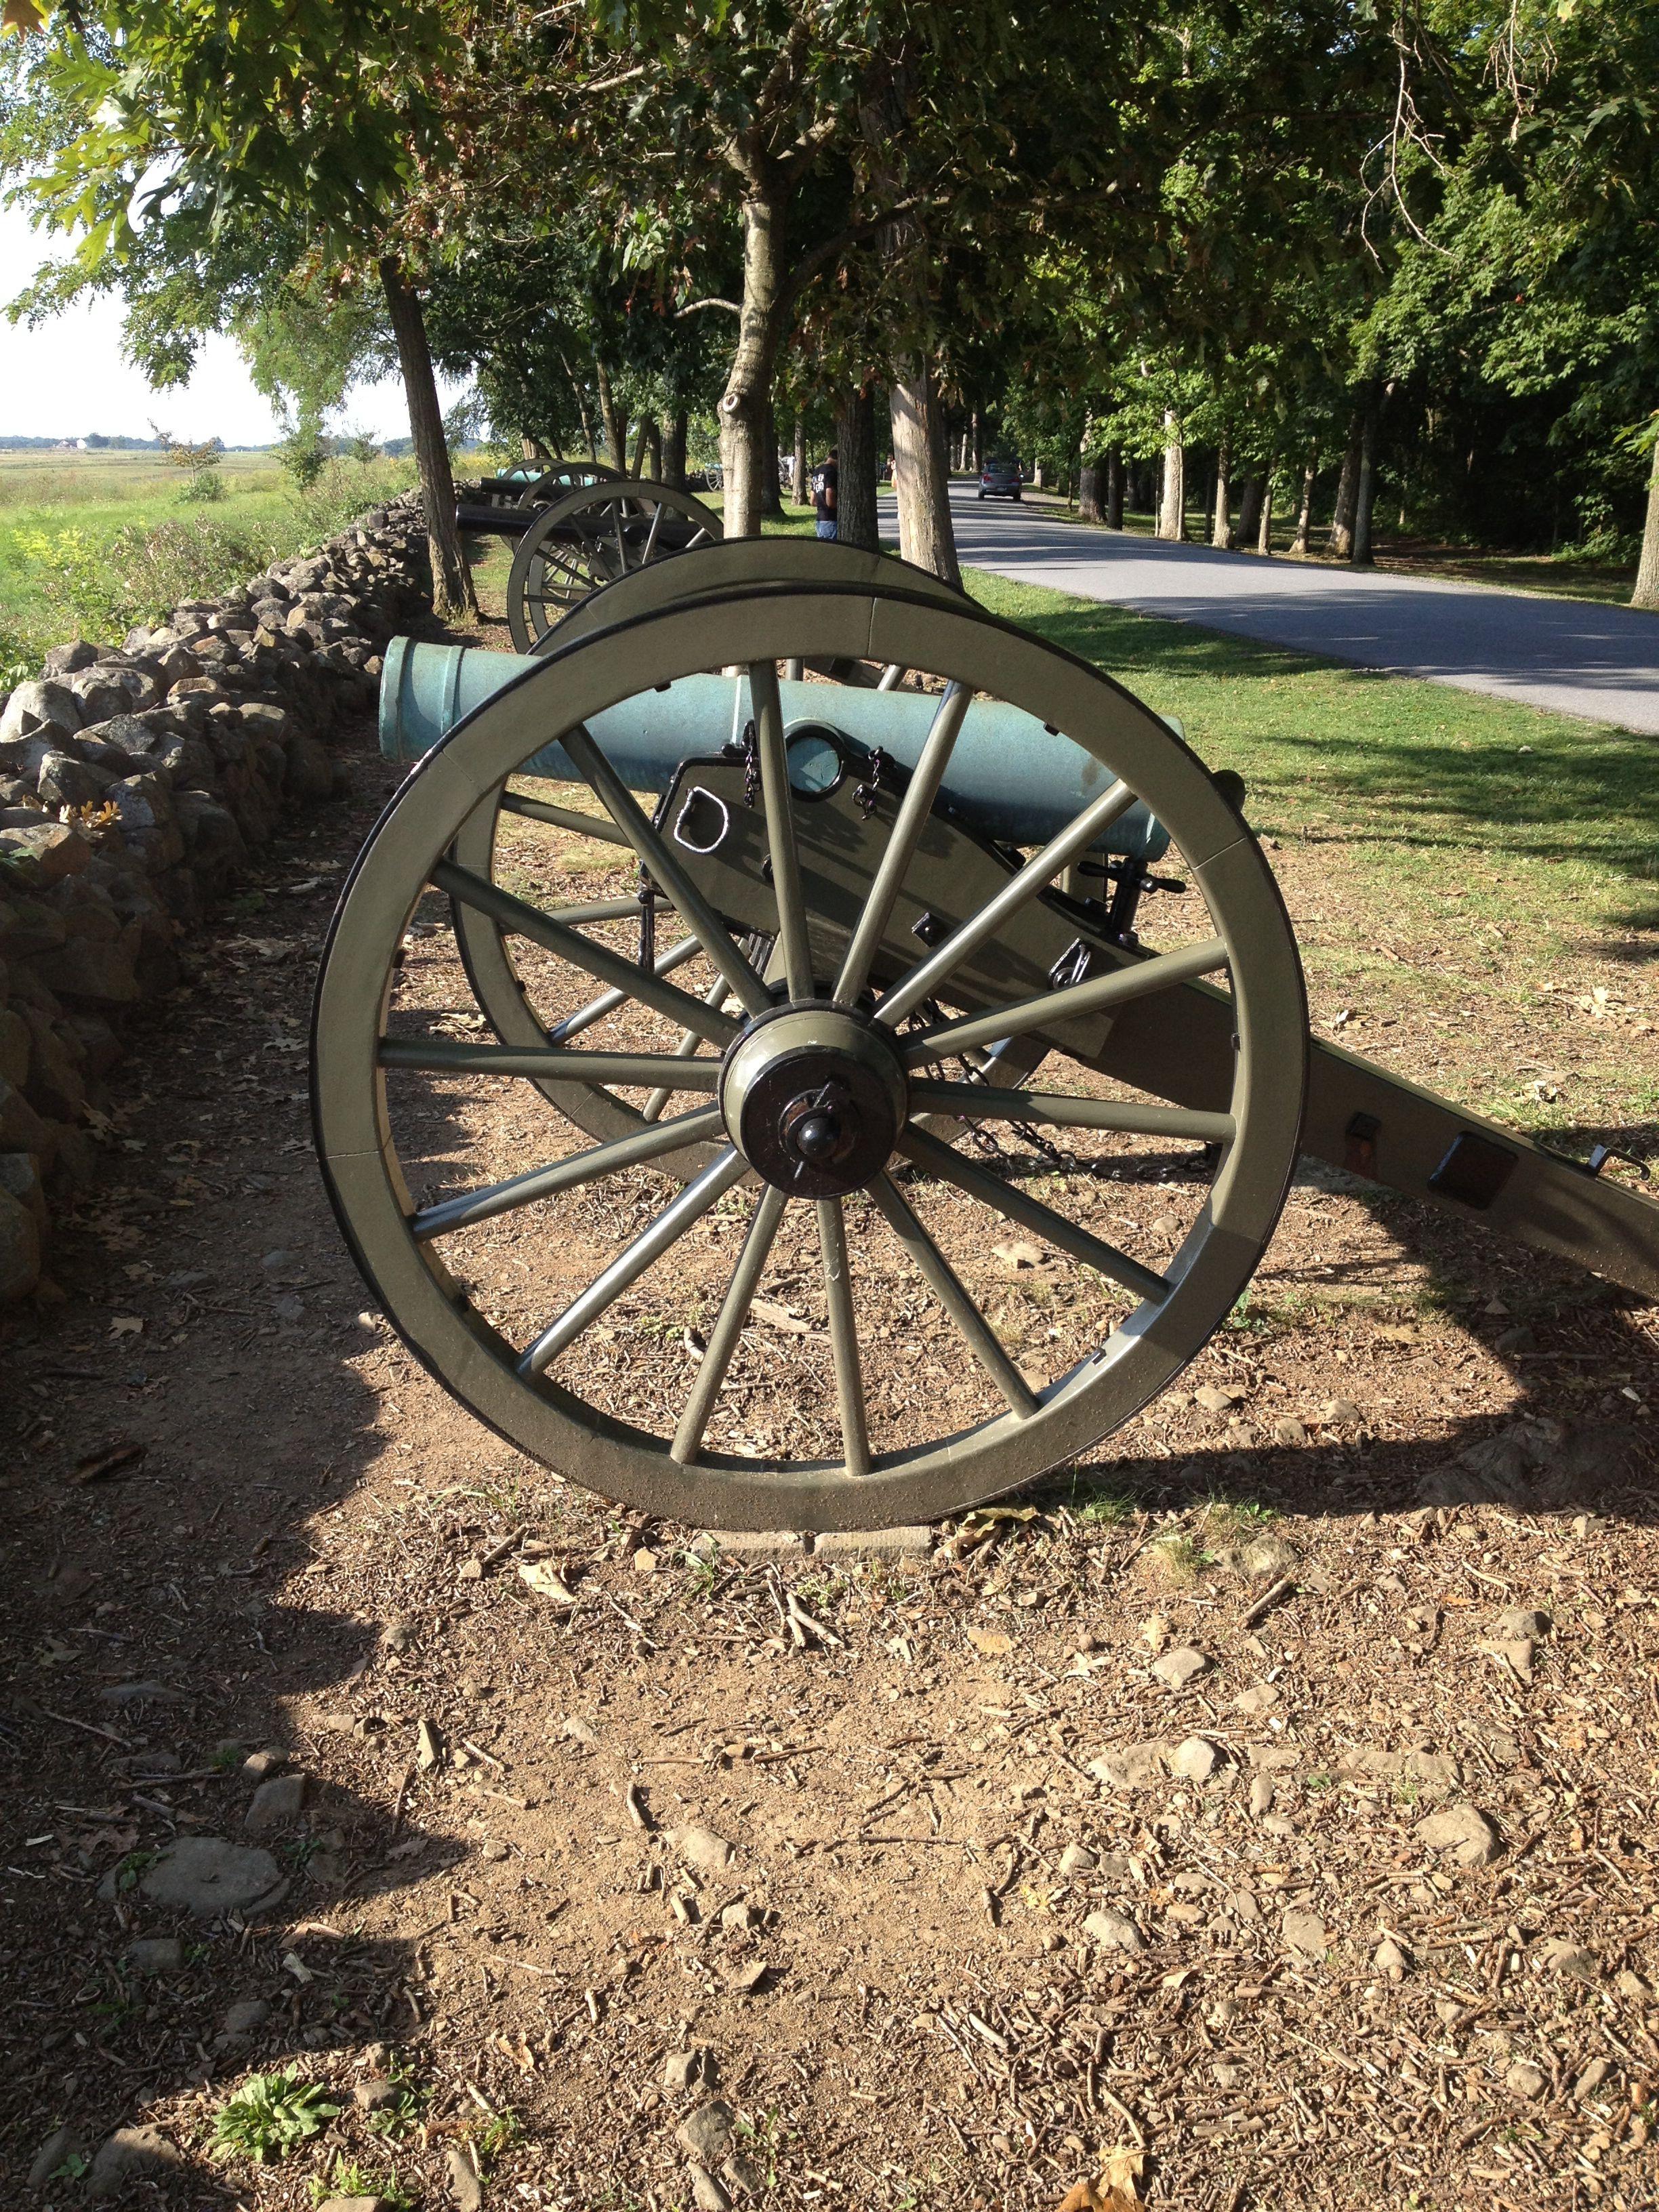 Howitzer at Gettysburg Battlefield | Monuments, Memorials & Museums